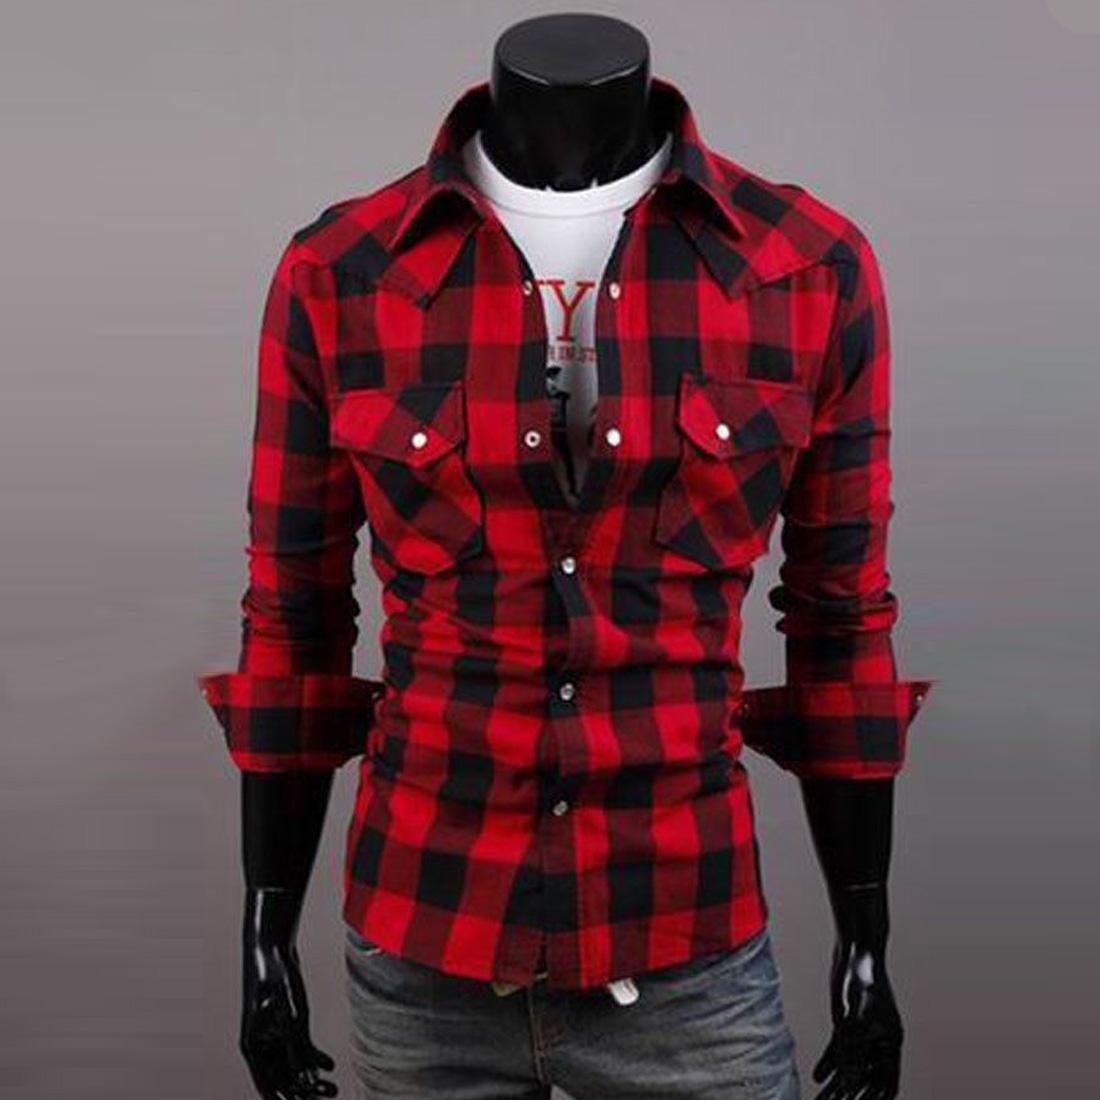 High Quality Checks Shirt Promotion-Shop for High Quality ...